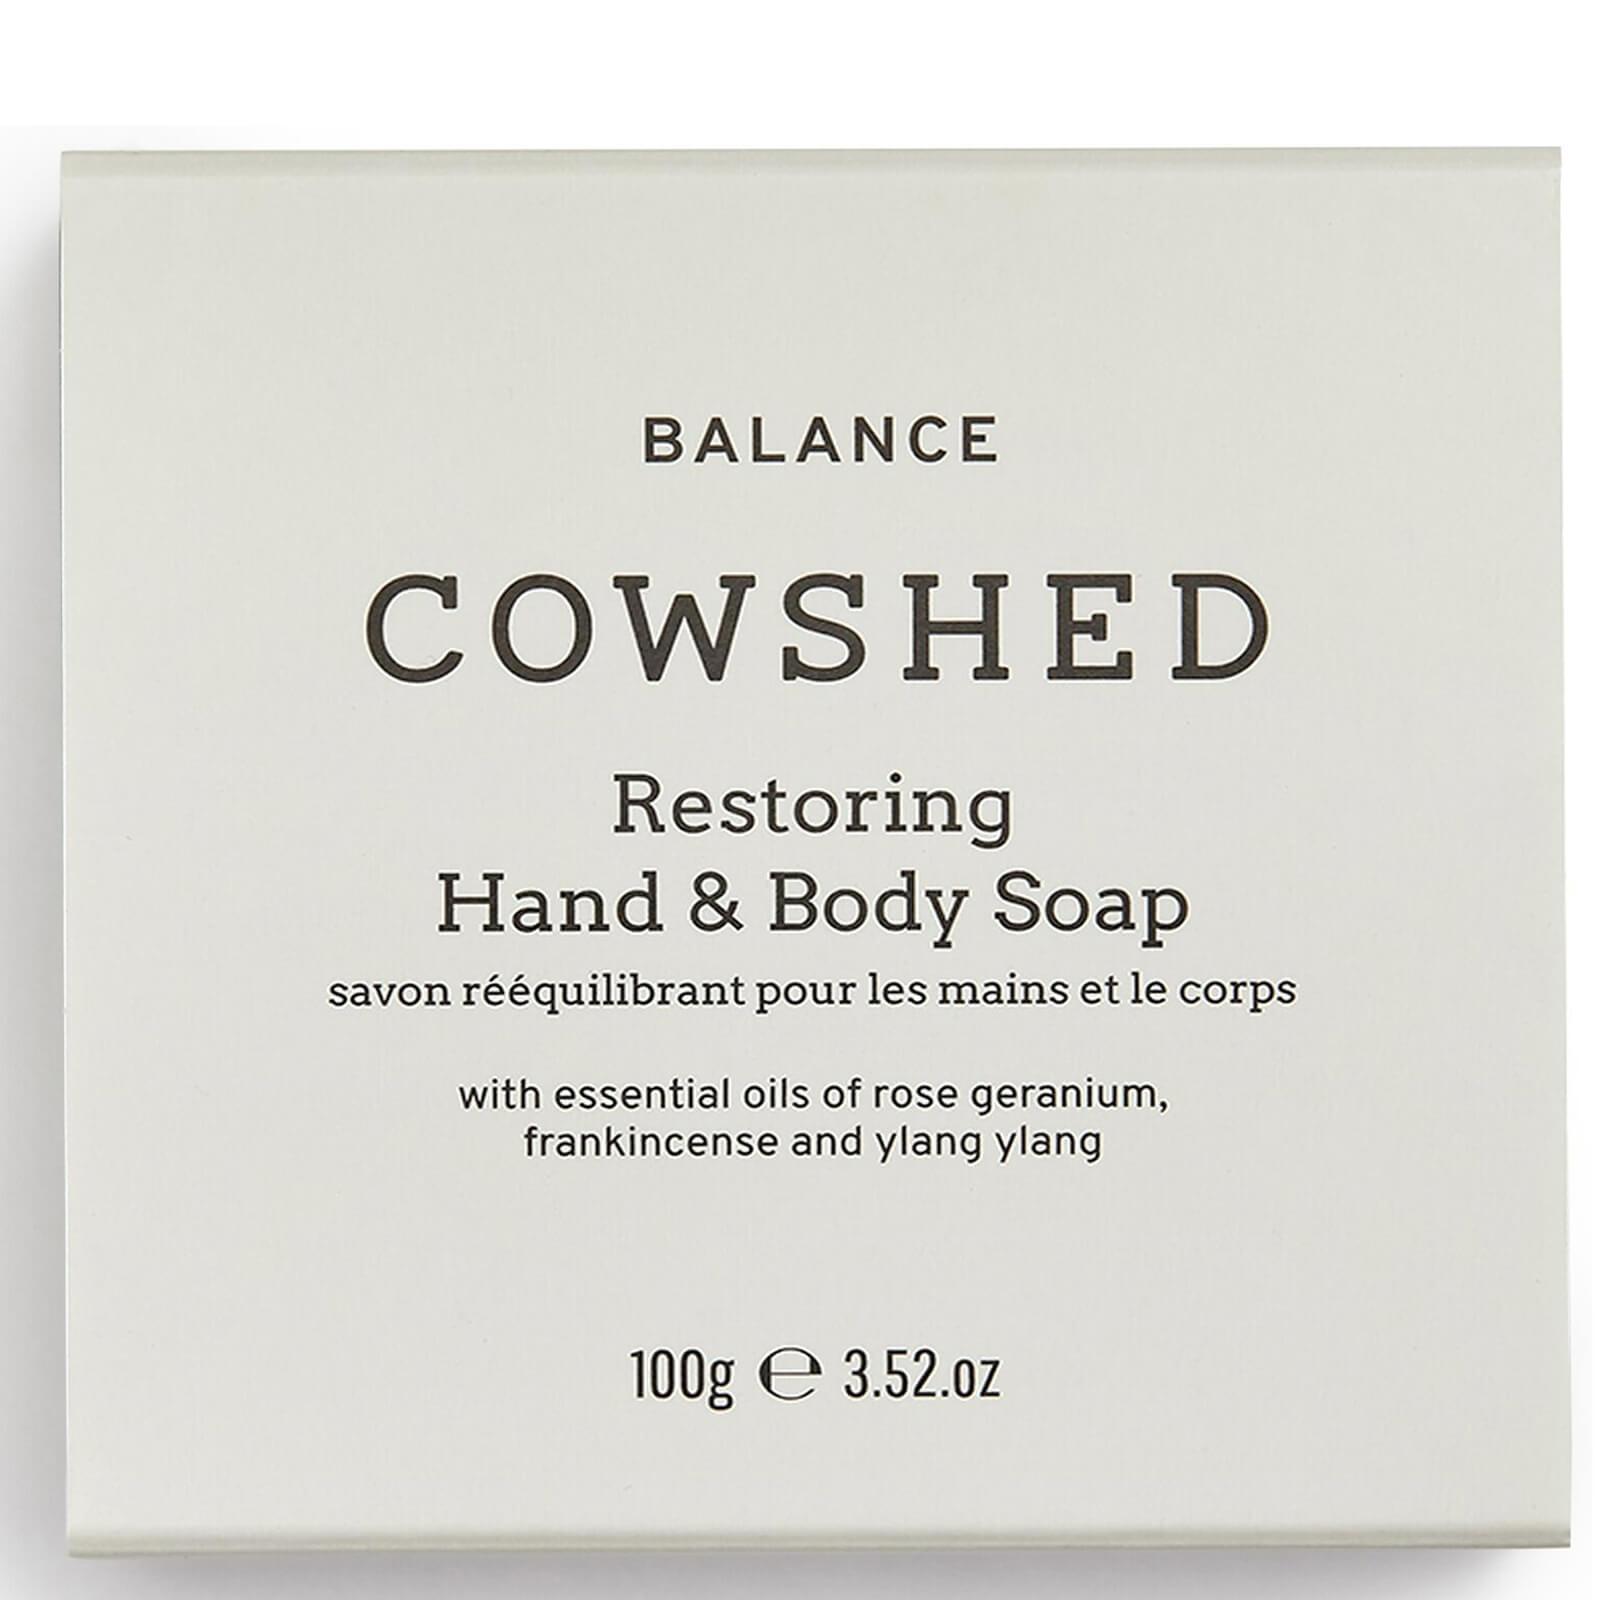 Купить Cowshed Balance Hand & Body Soap